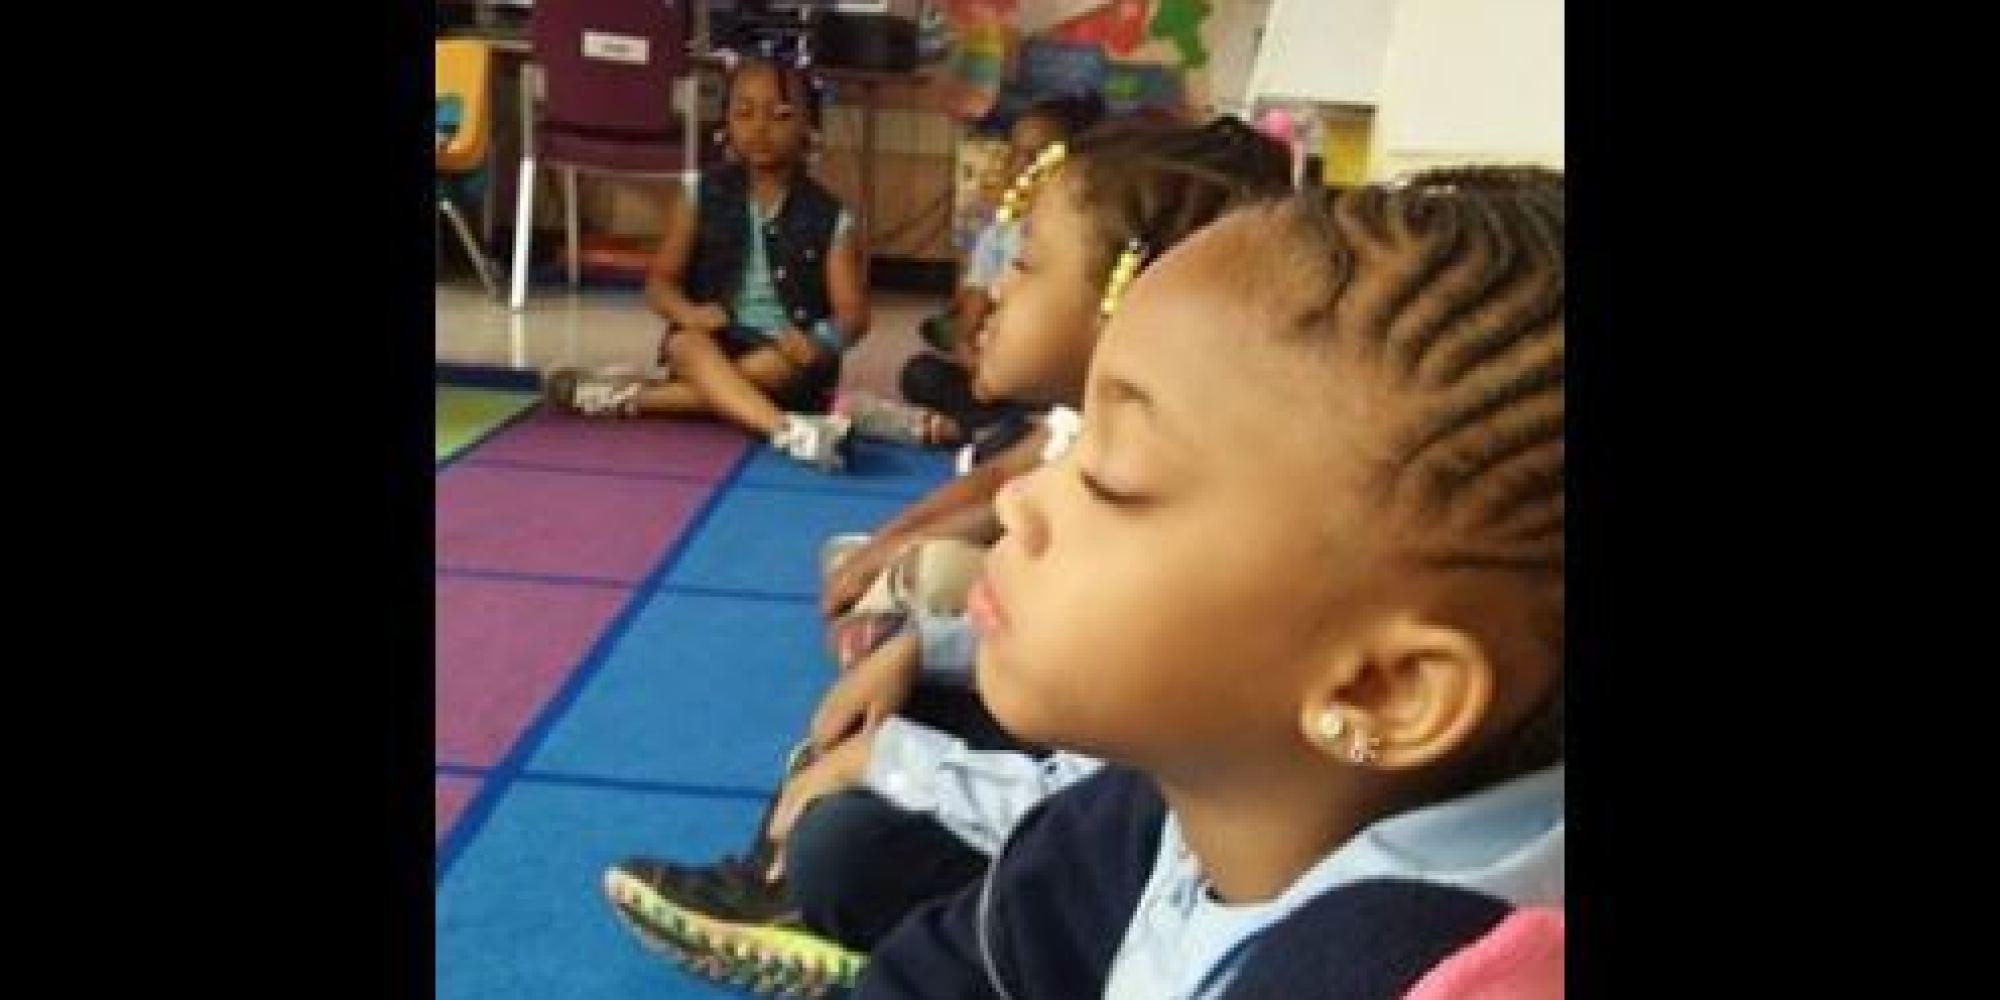 meditationforstressandanxiety stressreliefmeditation stressrelief relaxation stress meditation yoga aromatherapy wellbeing relax hypnosis peace timemanagement exercise mindfulness mindset zen fitness chakras dontthinkfar chill music